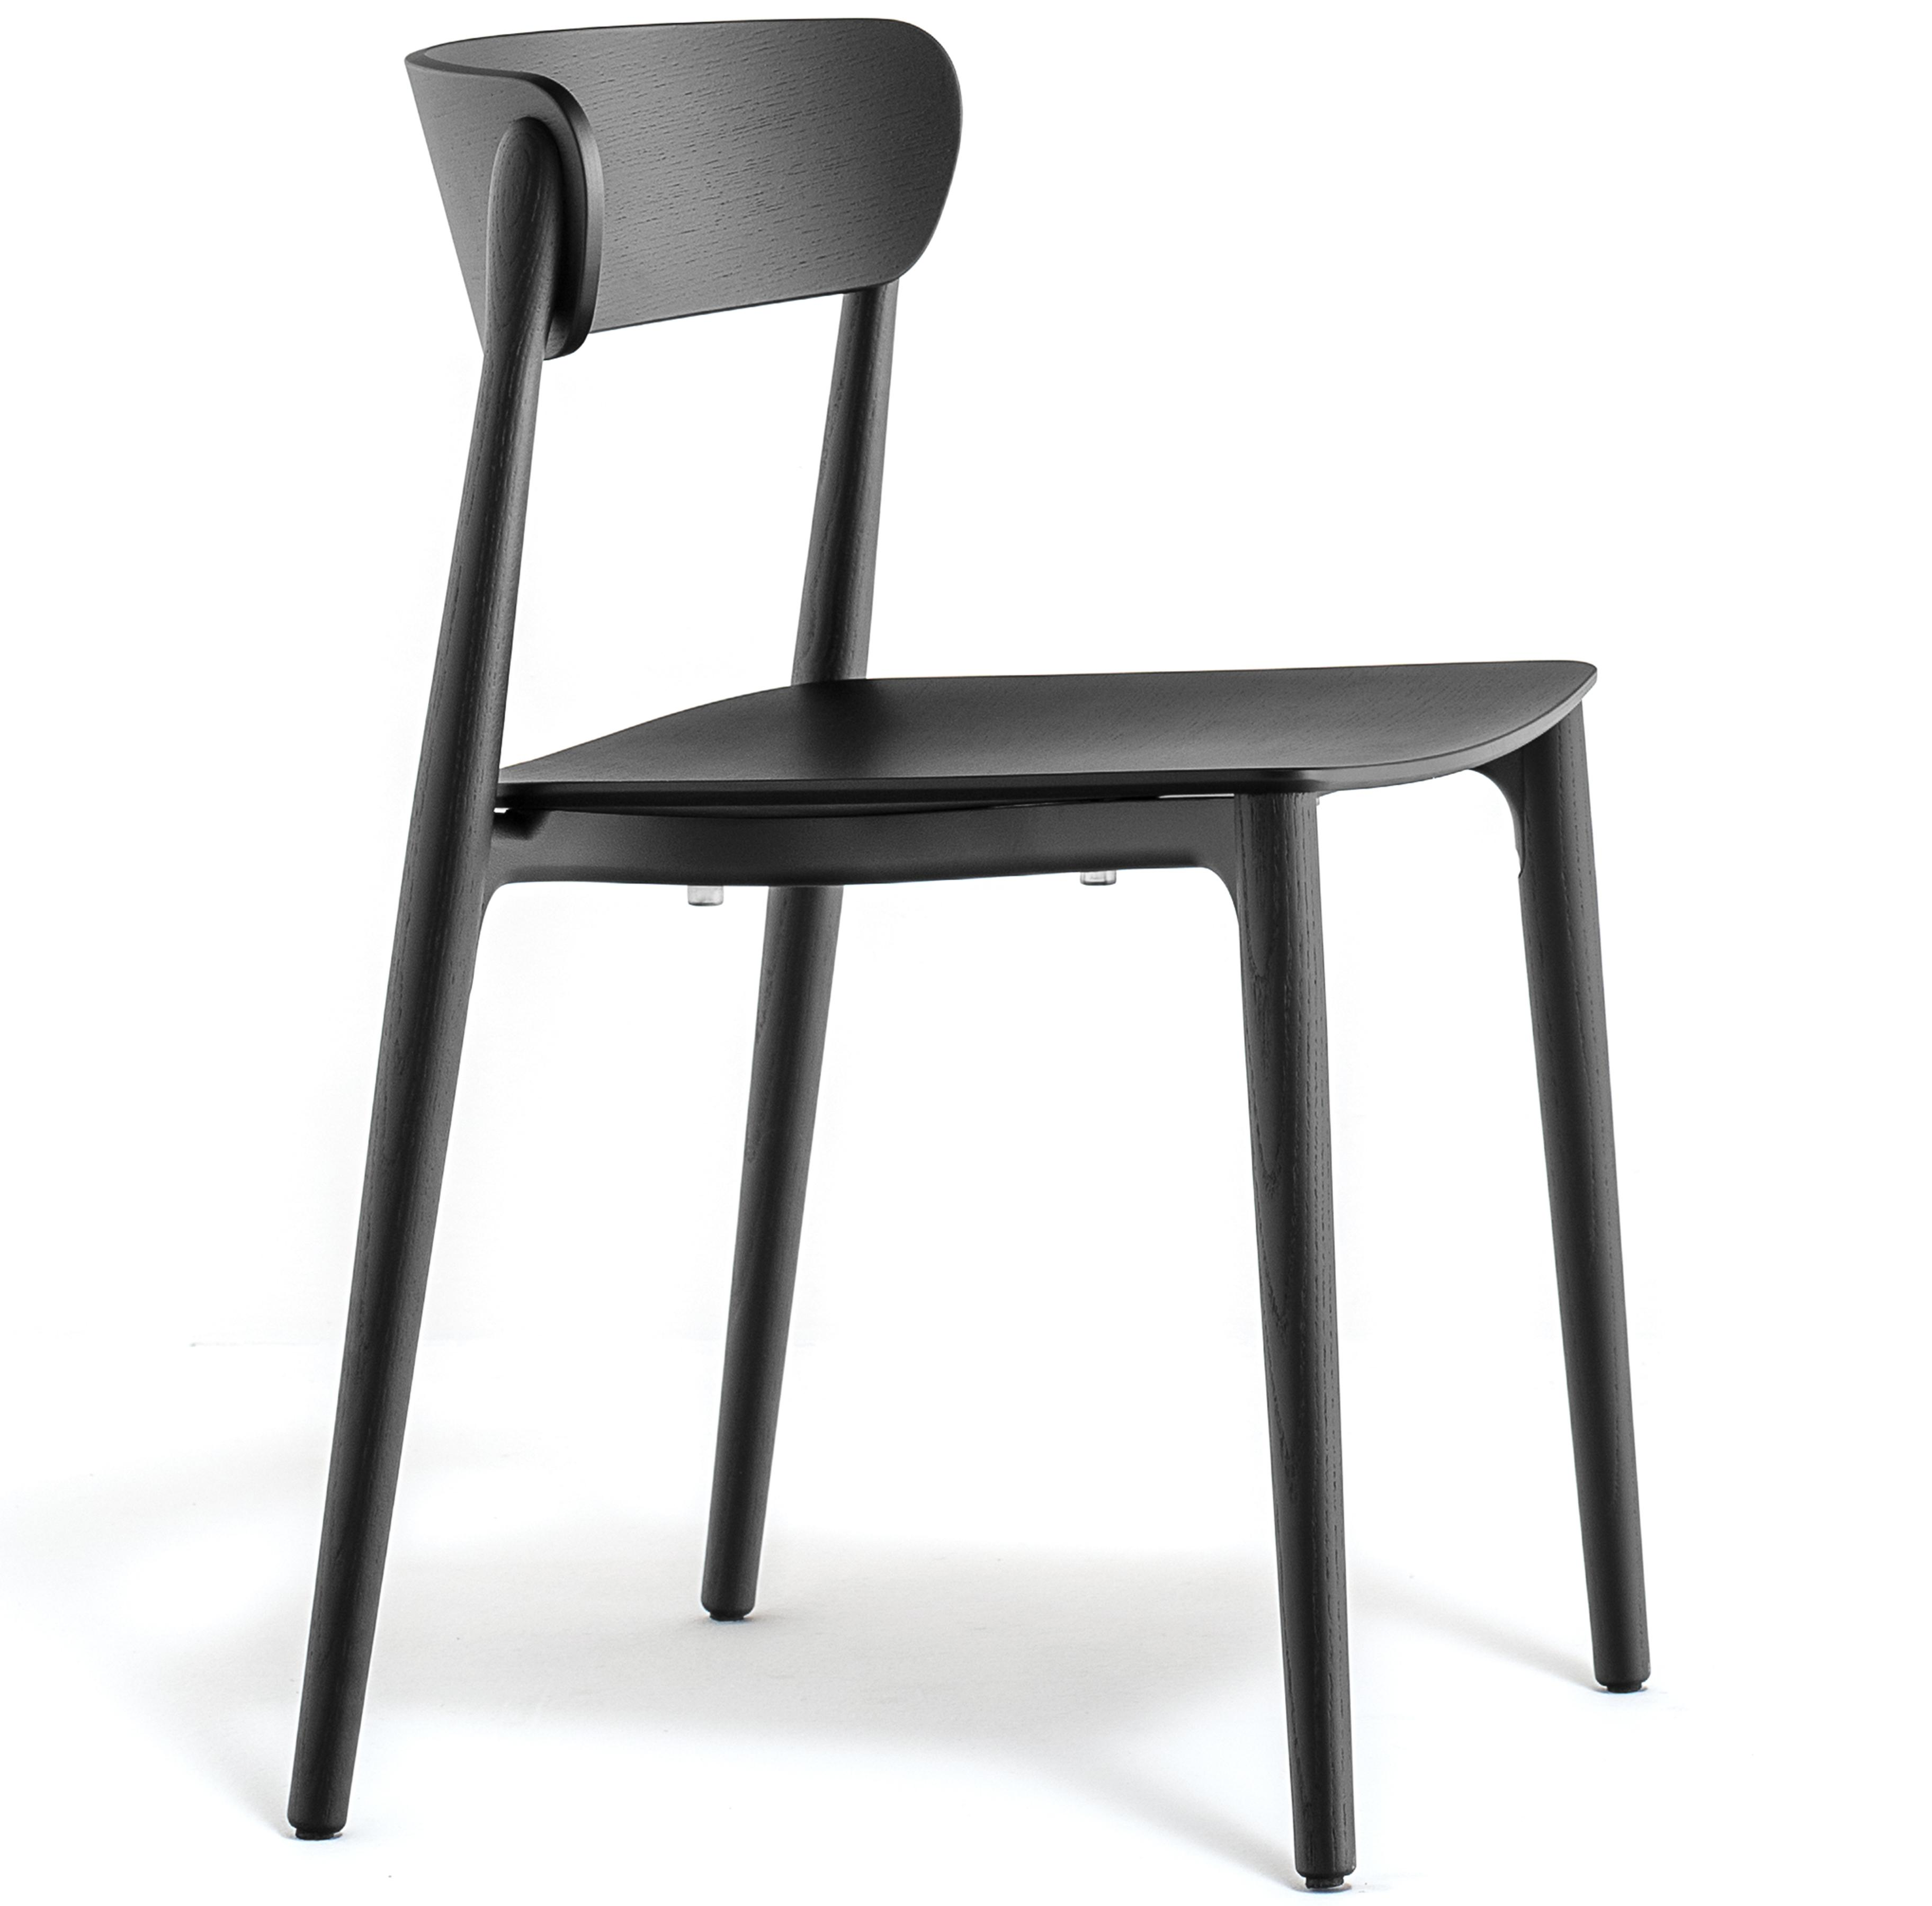 pedrali sedia nemea 2820 legno frassino newformsdesign